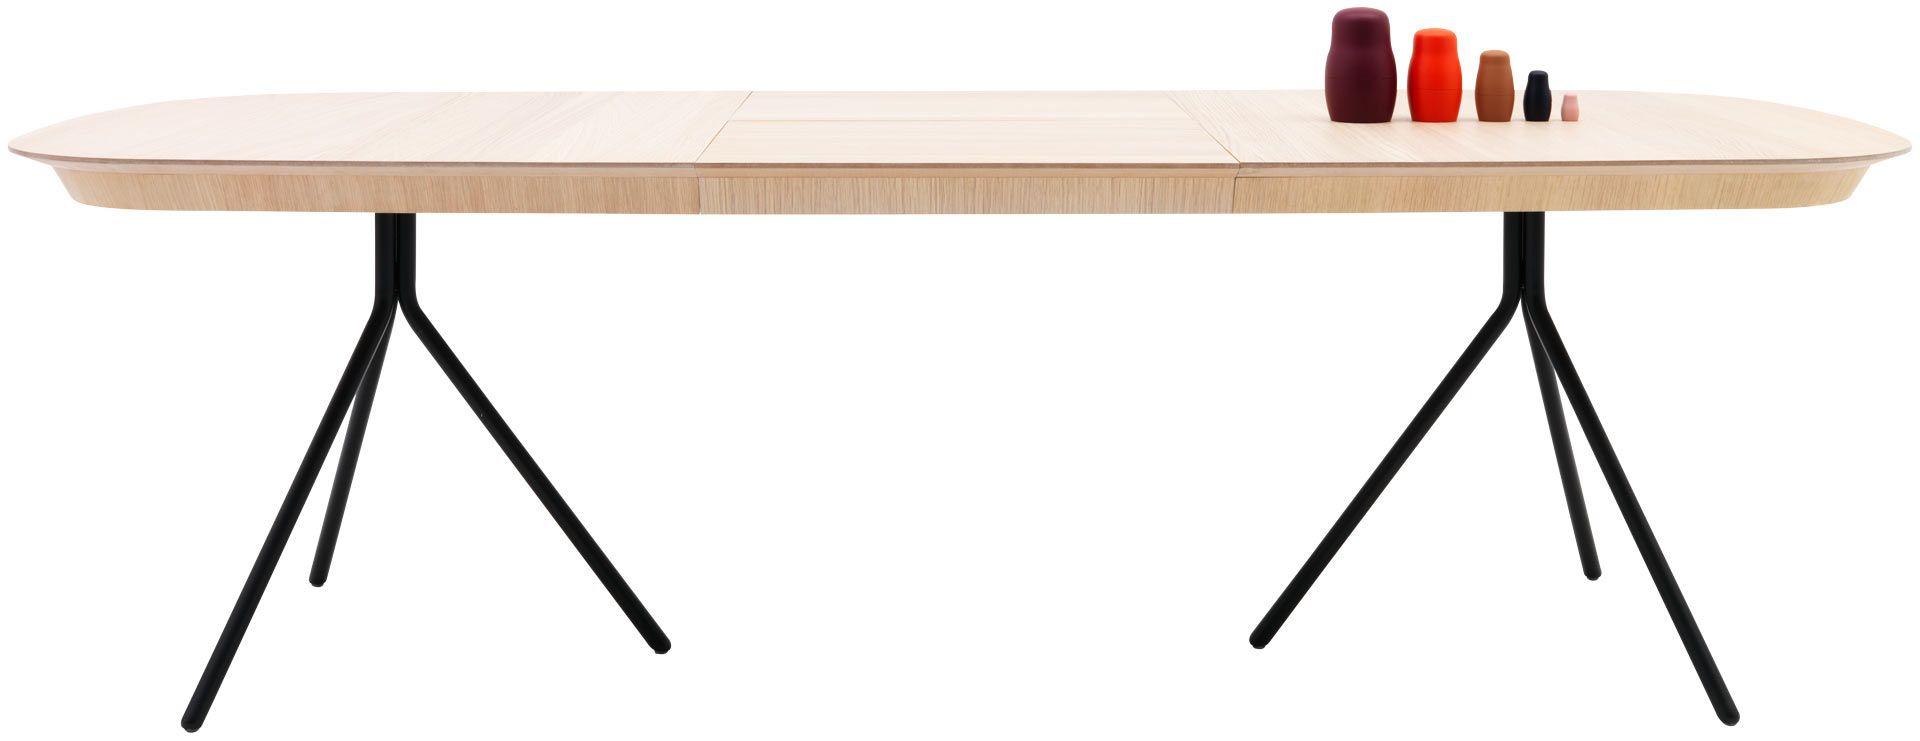 Boconcept Table Ottawa Avec Allonge S 1449 Table Salle A Manger Table Design Salle A Manger Design